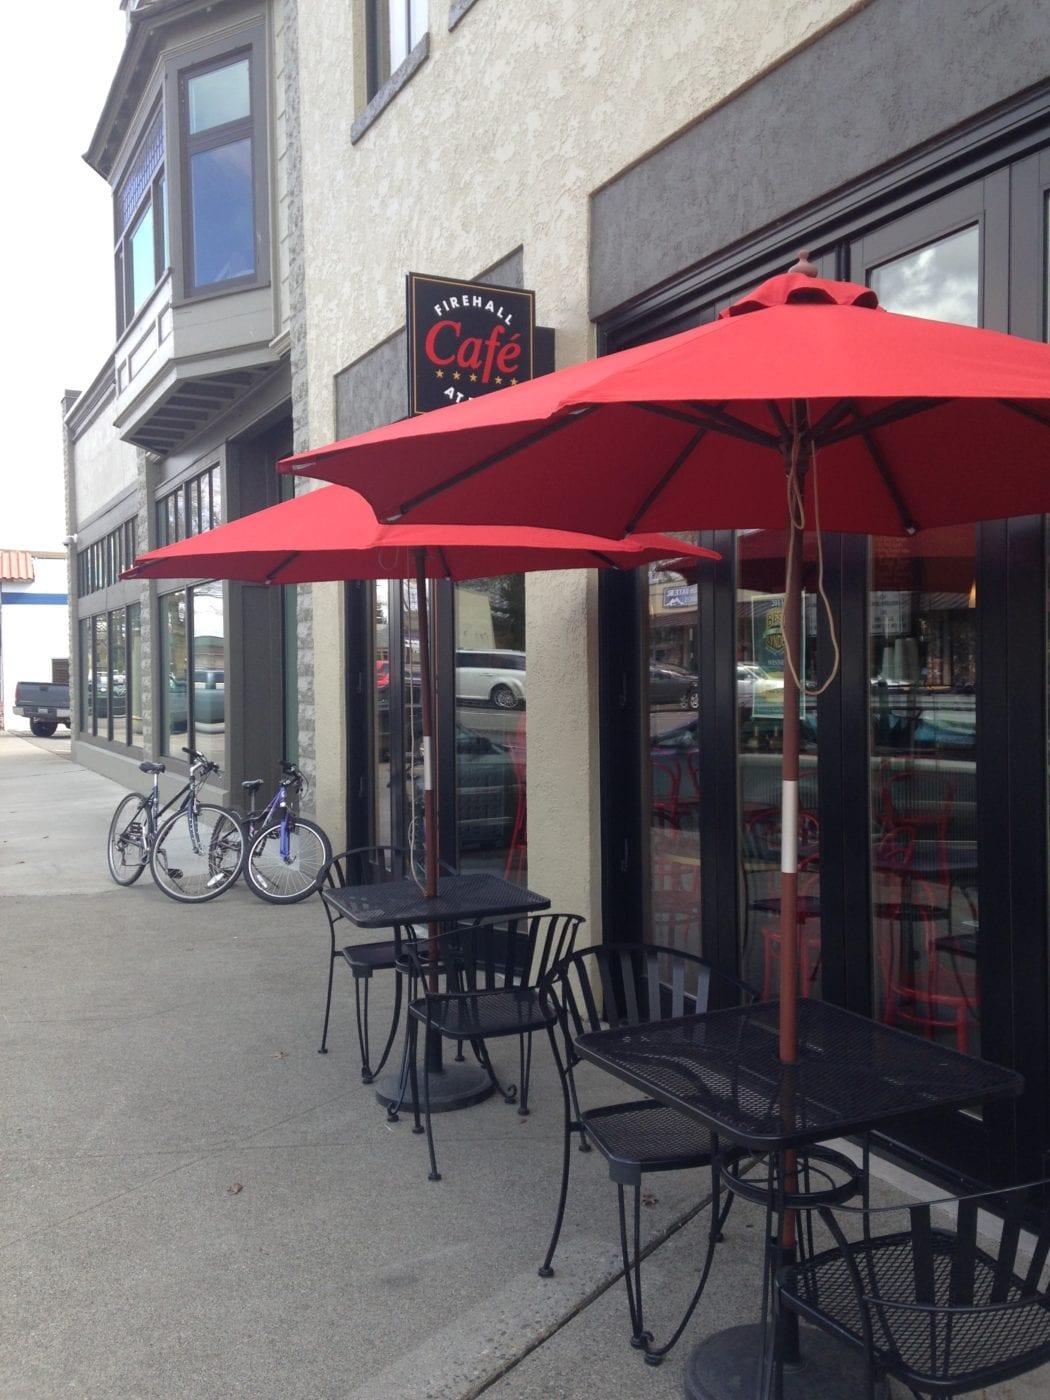 Firehall Cafe exterior